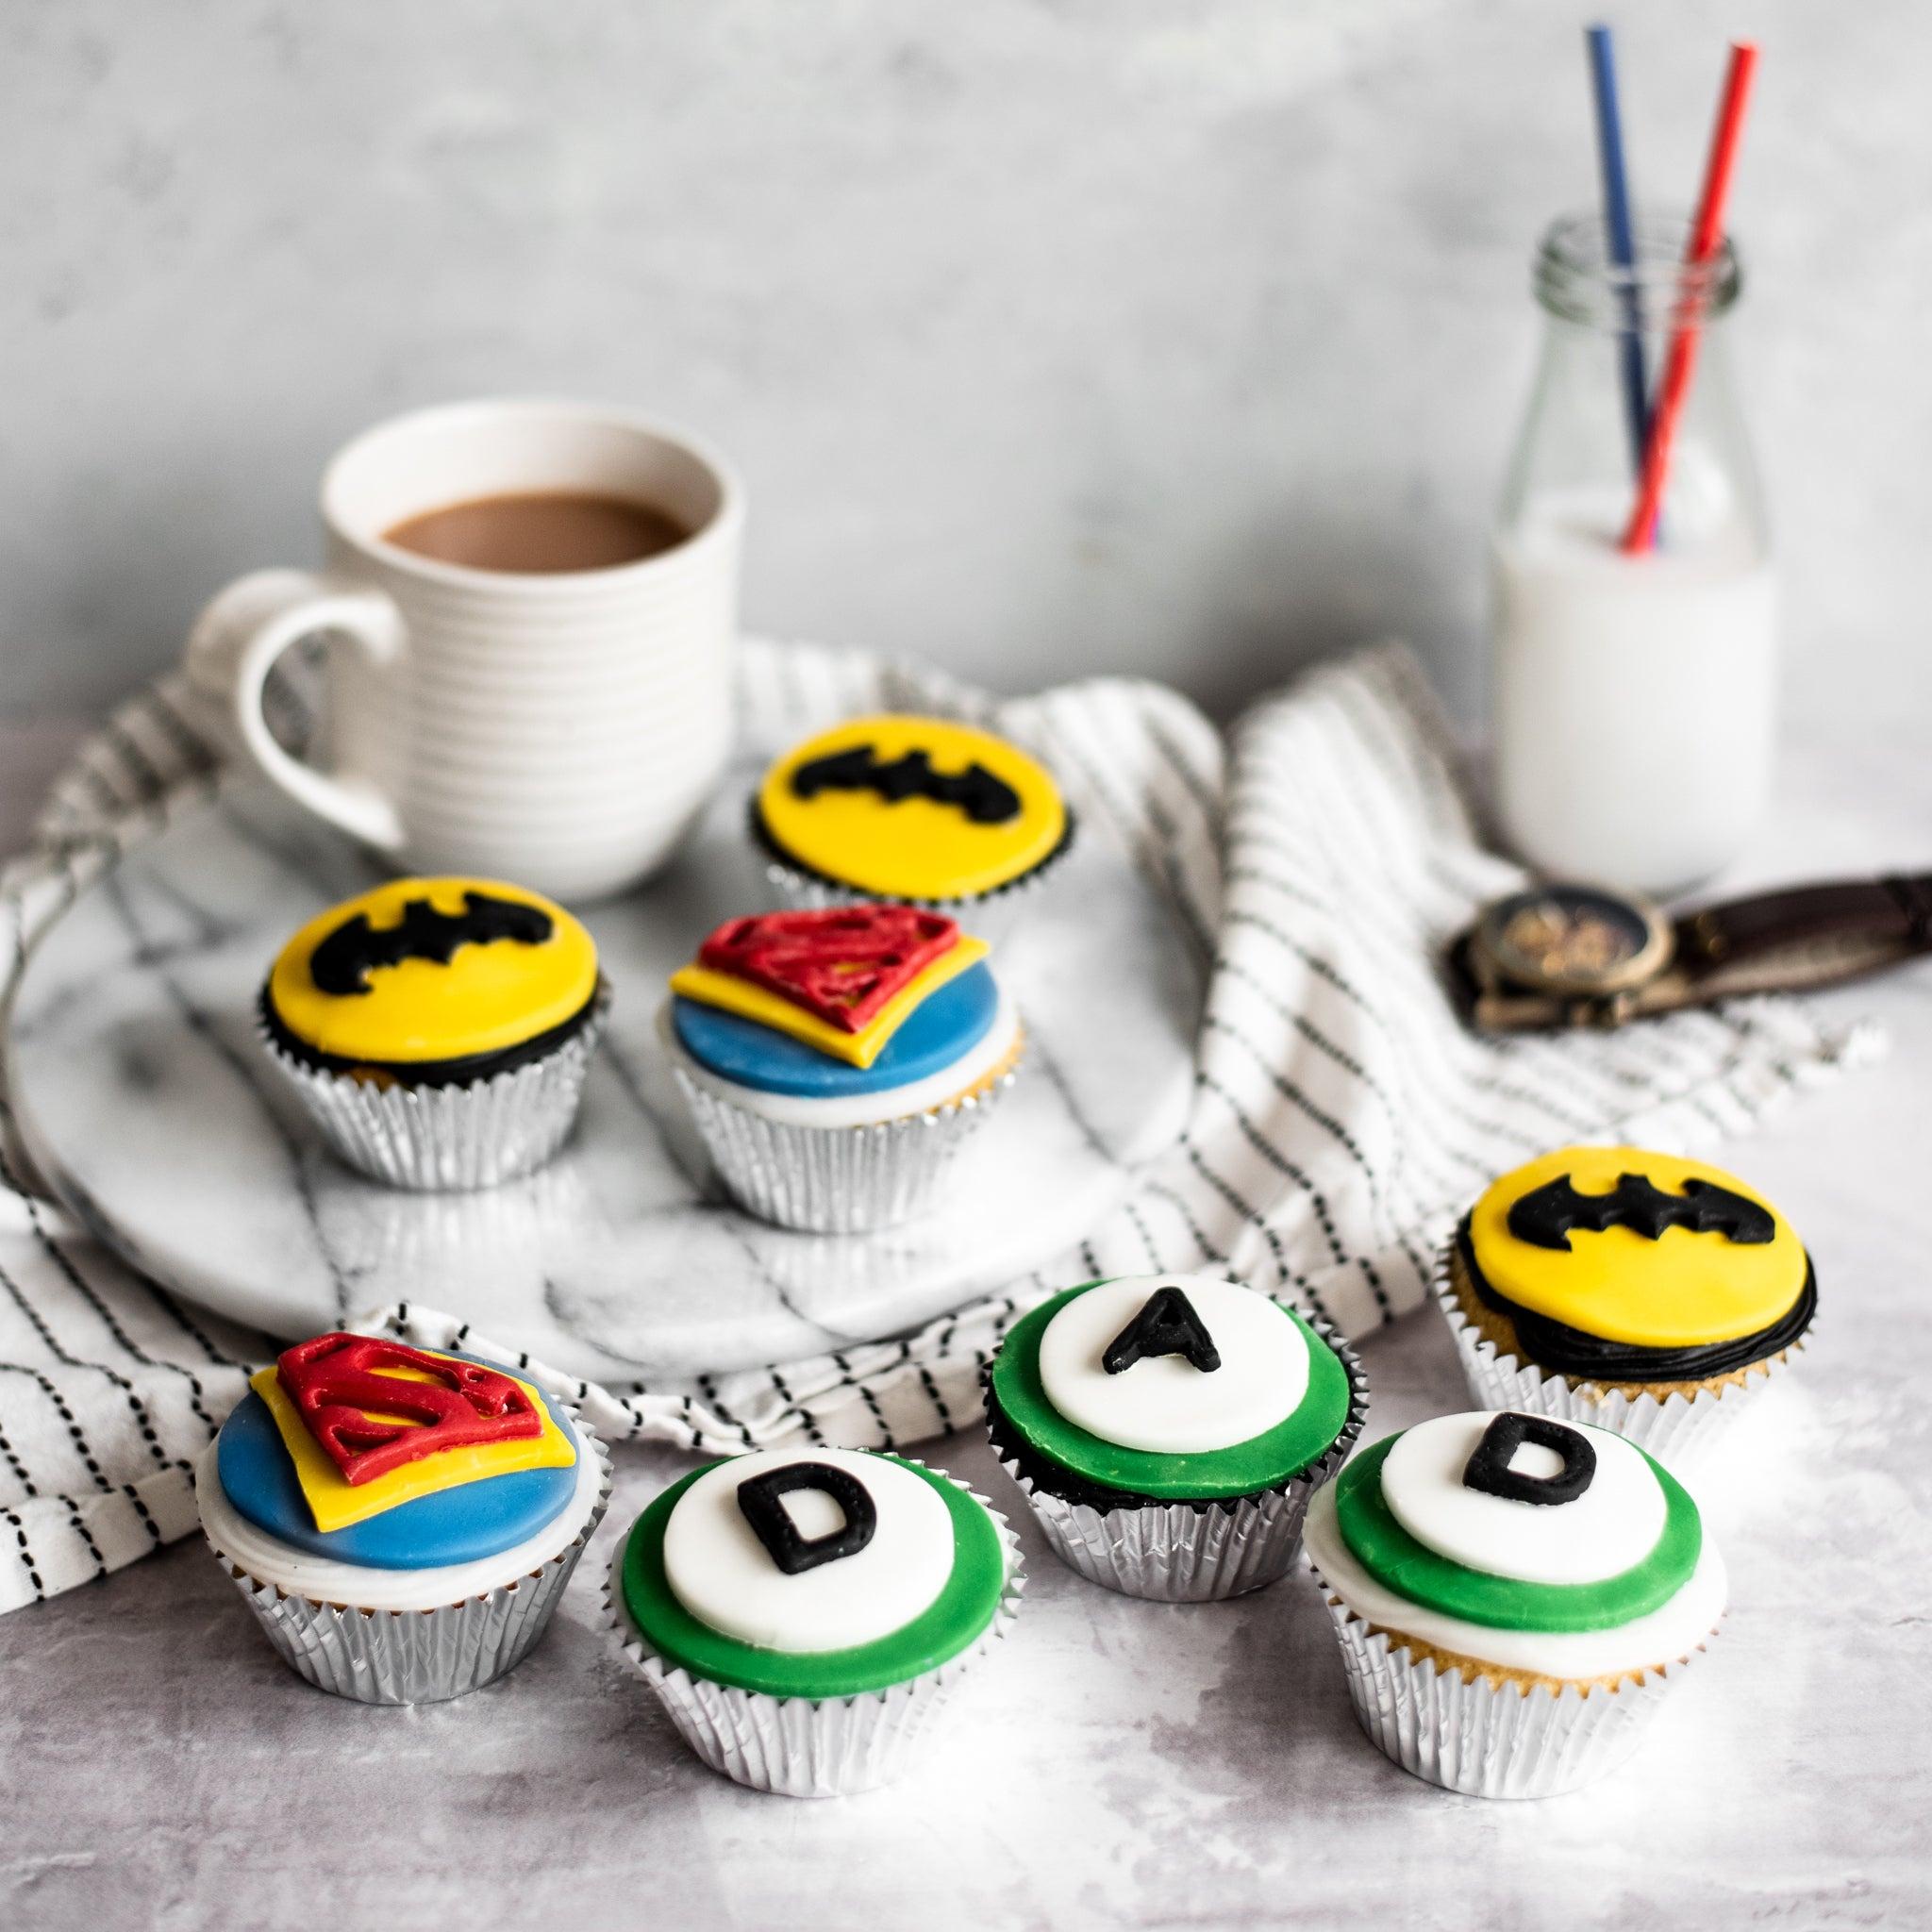 Fathers-Day-Superhero-Cupcakes-SQUARE-6.jpg